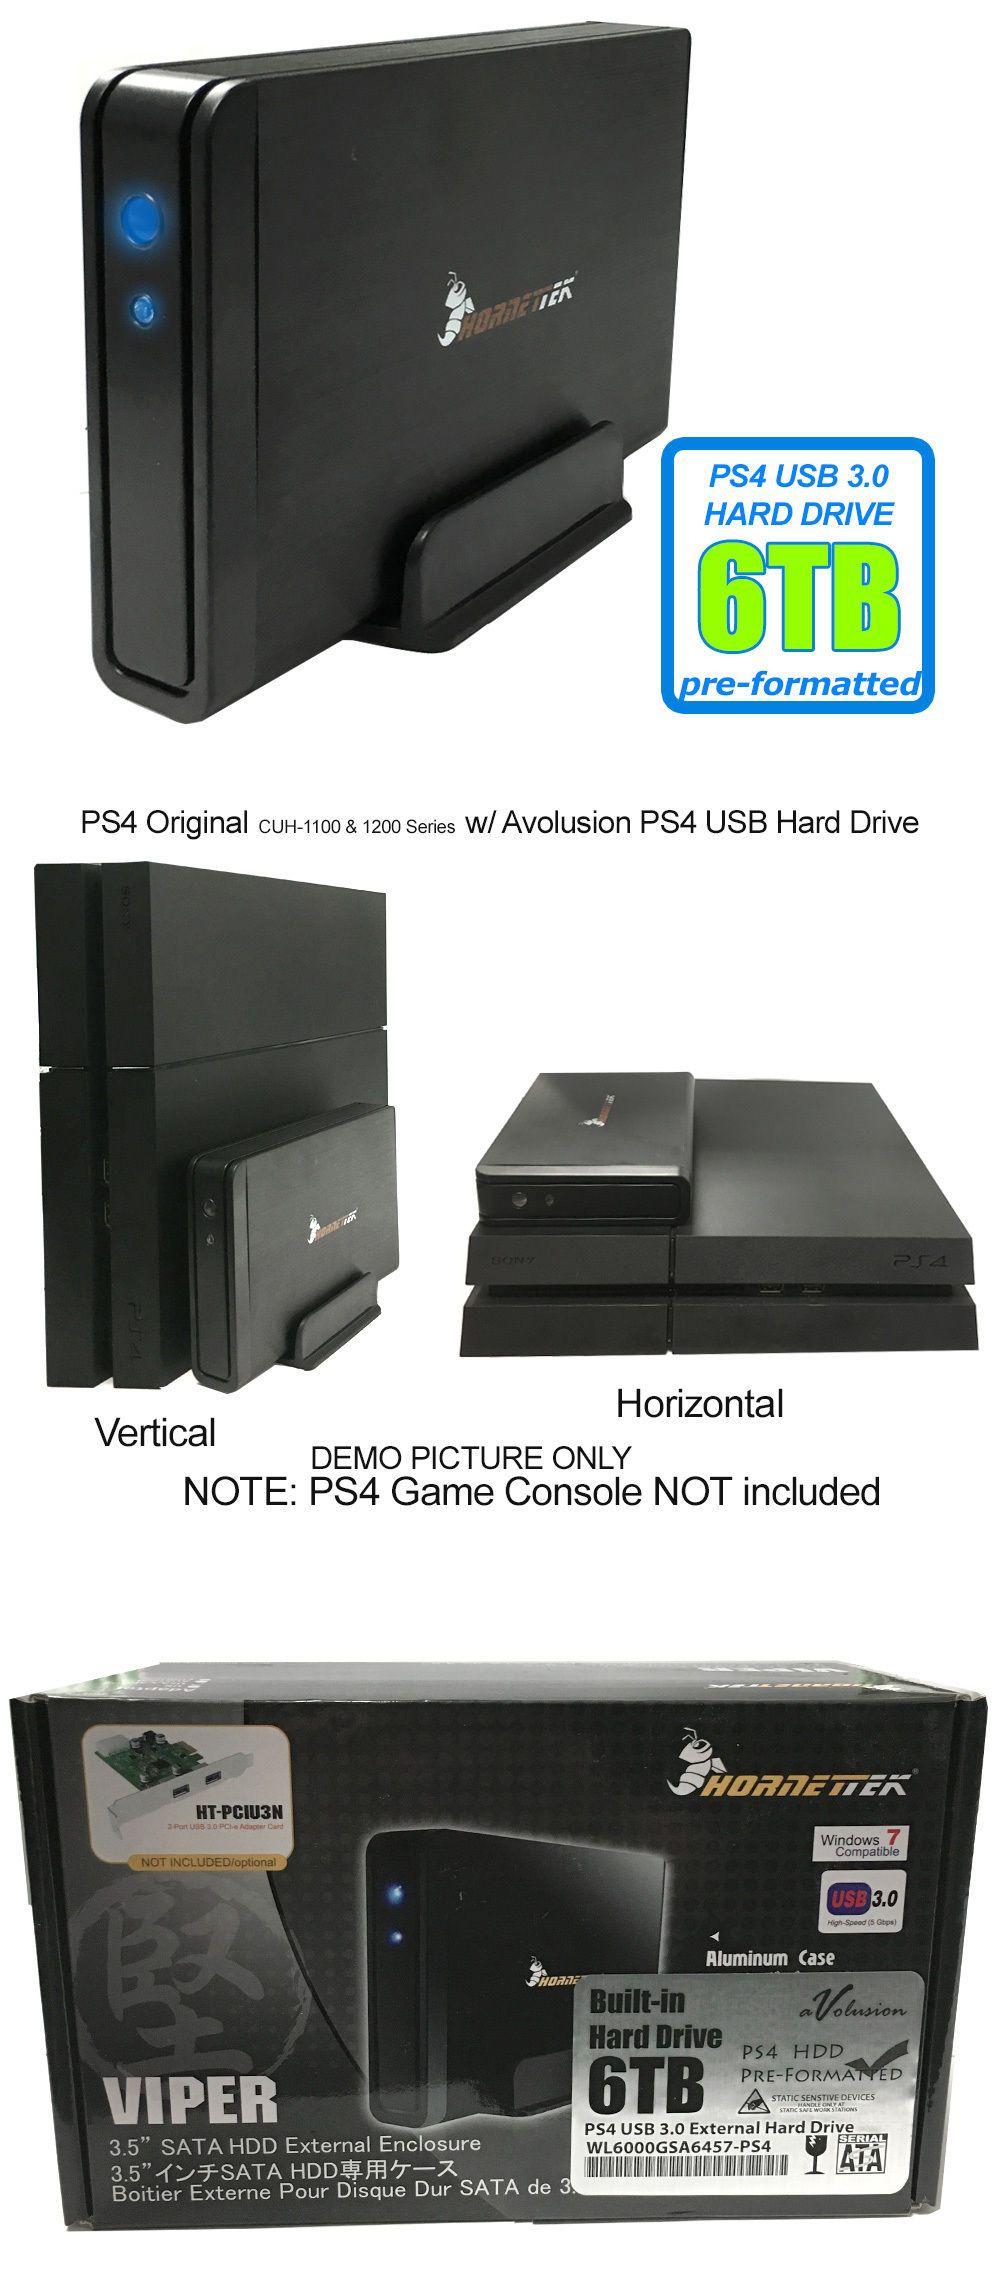 Hornettek Viper 6tb Usb 3 0 External Ps4 Hard Drive For Ps4 Ps4 Slim Ps4 Pro Ps4 Hard Drive Hard Drive Xbox Hard Drive